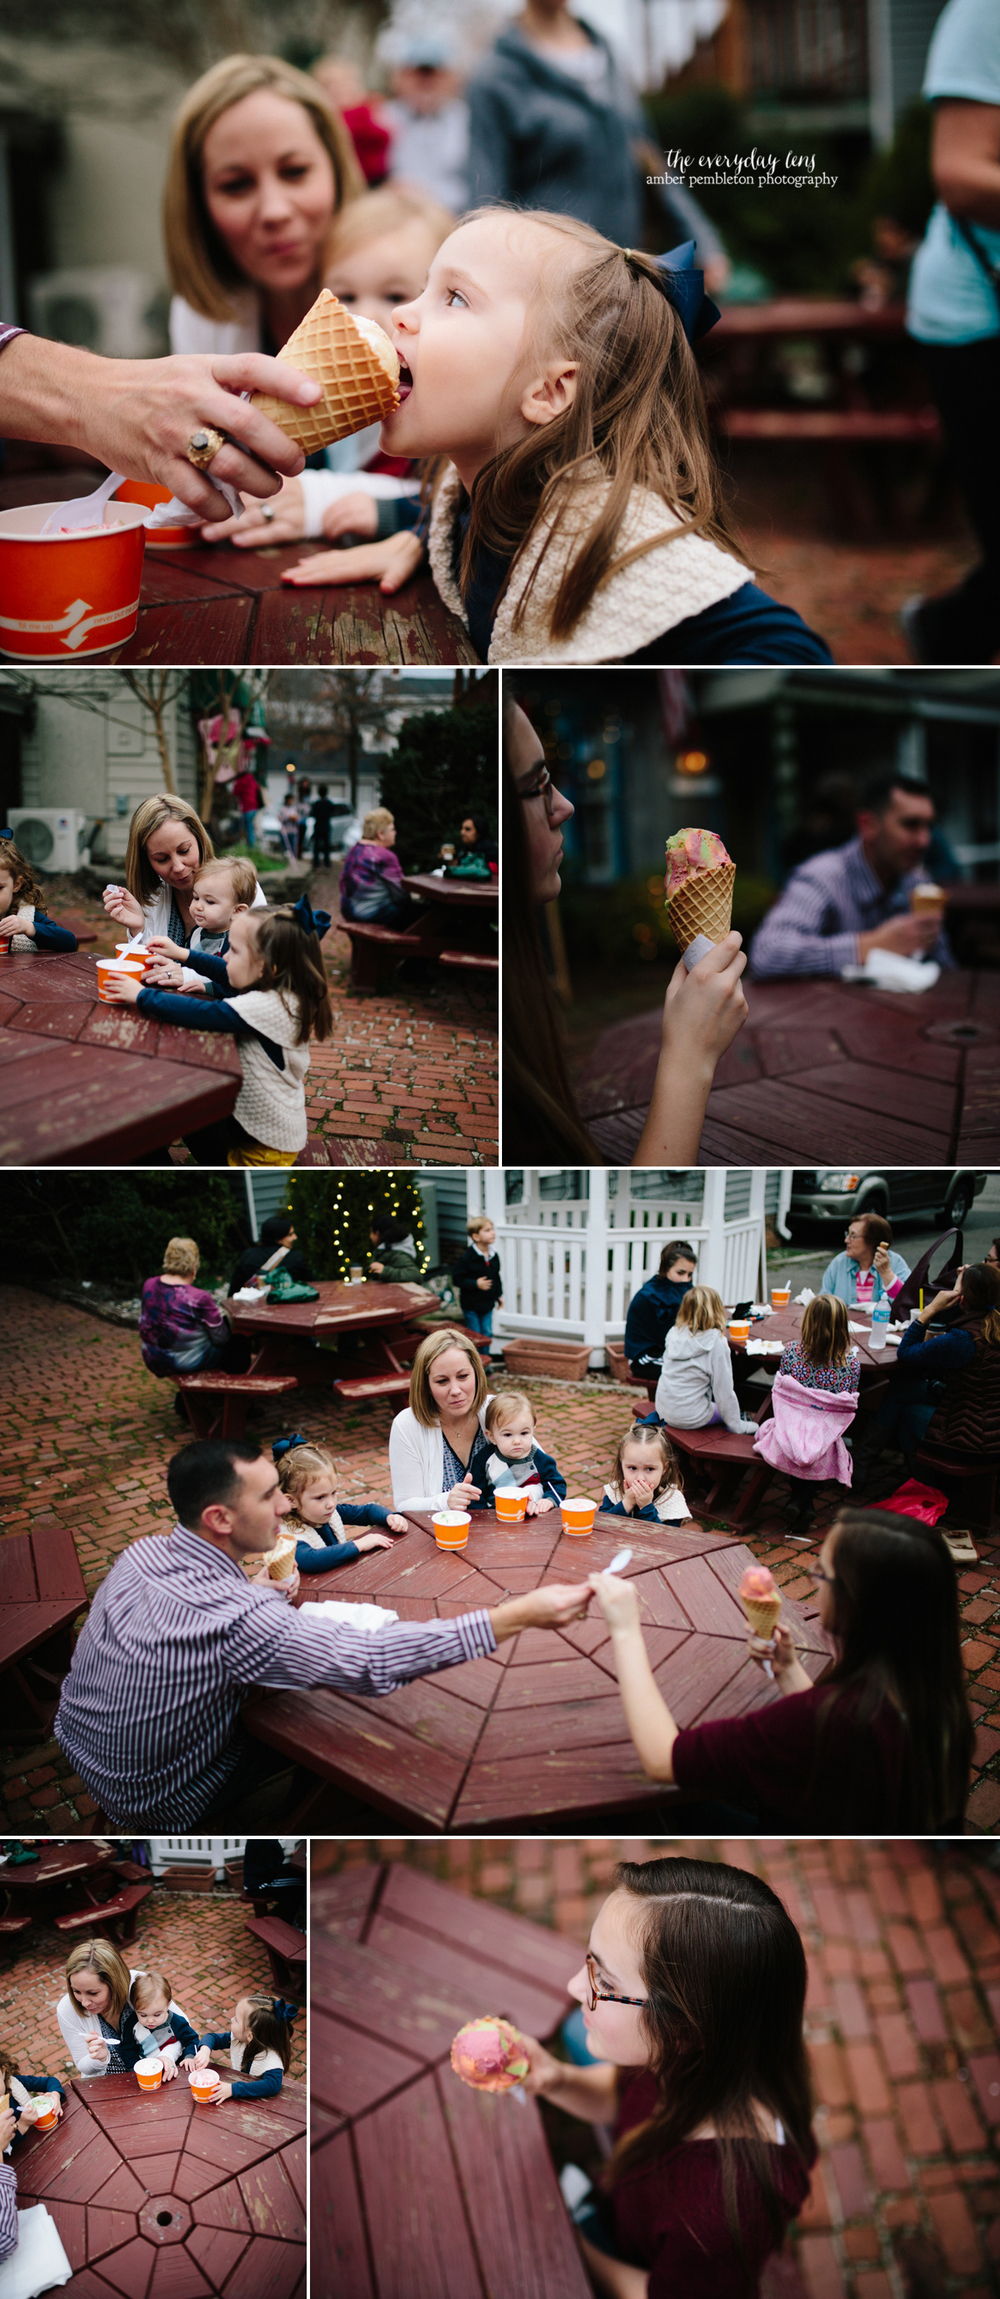 family-aeting-ice-cream-documentary-photography.jpg